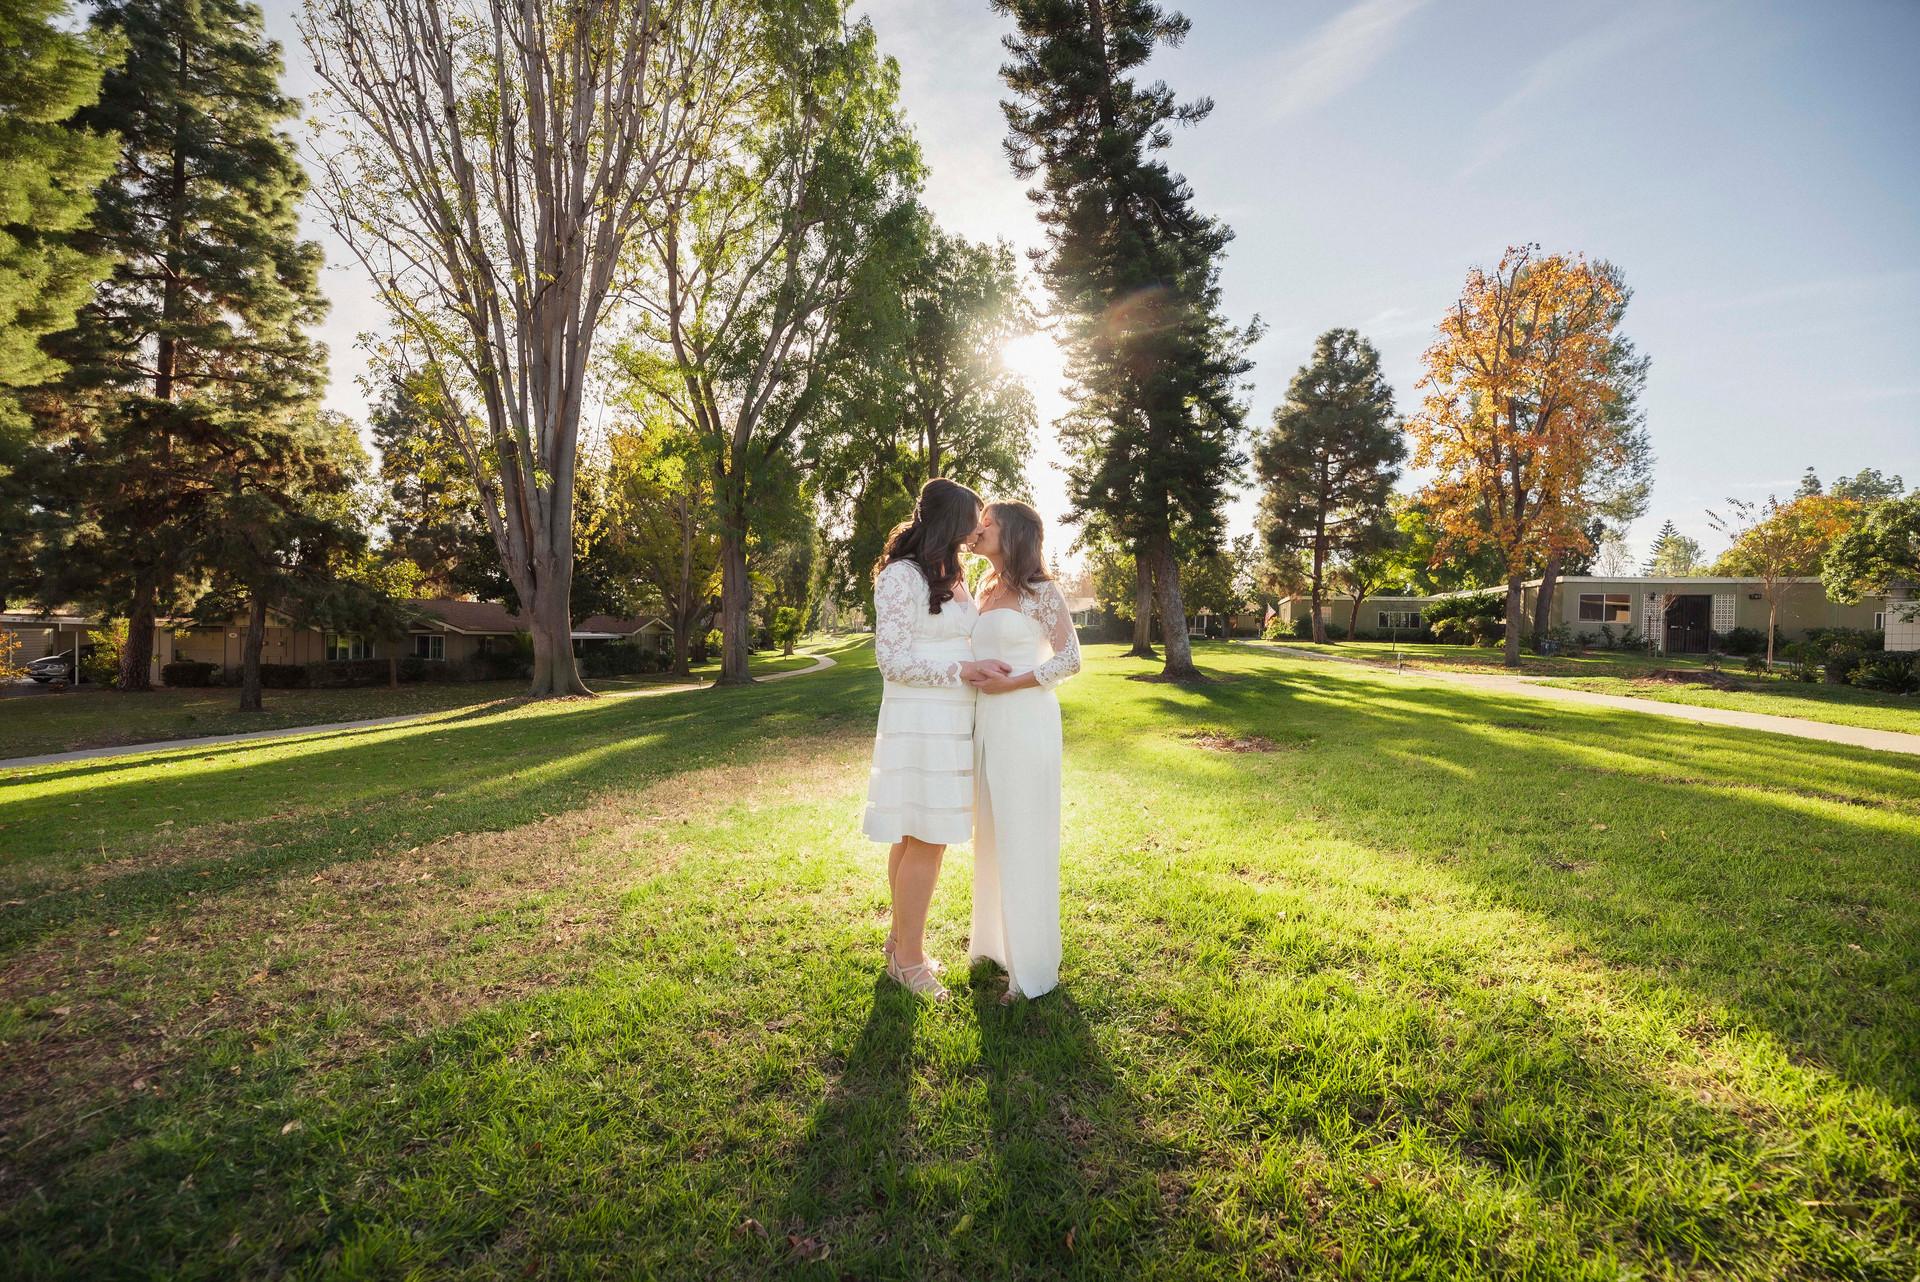 Los Angeles San Diego Irvine Orange County Southern California Wedding Photographer Norbert Tsi Photography